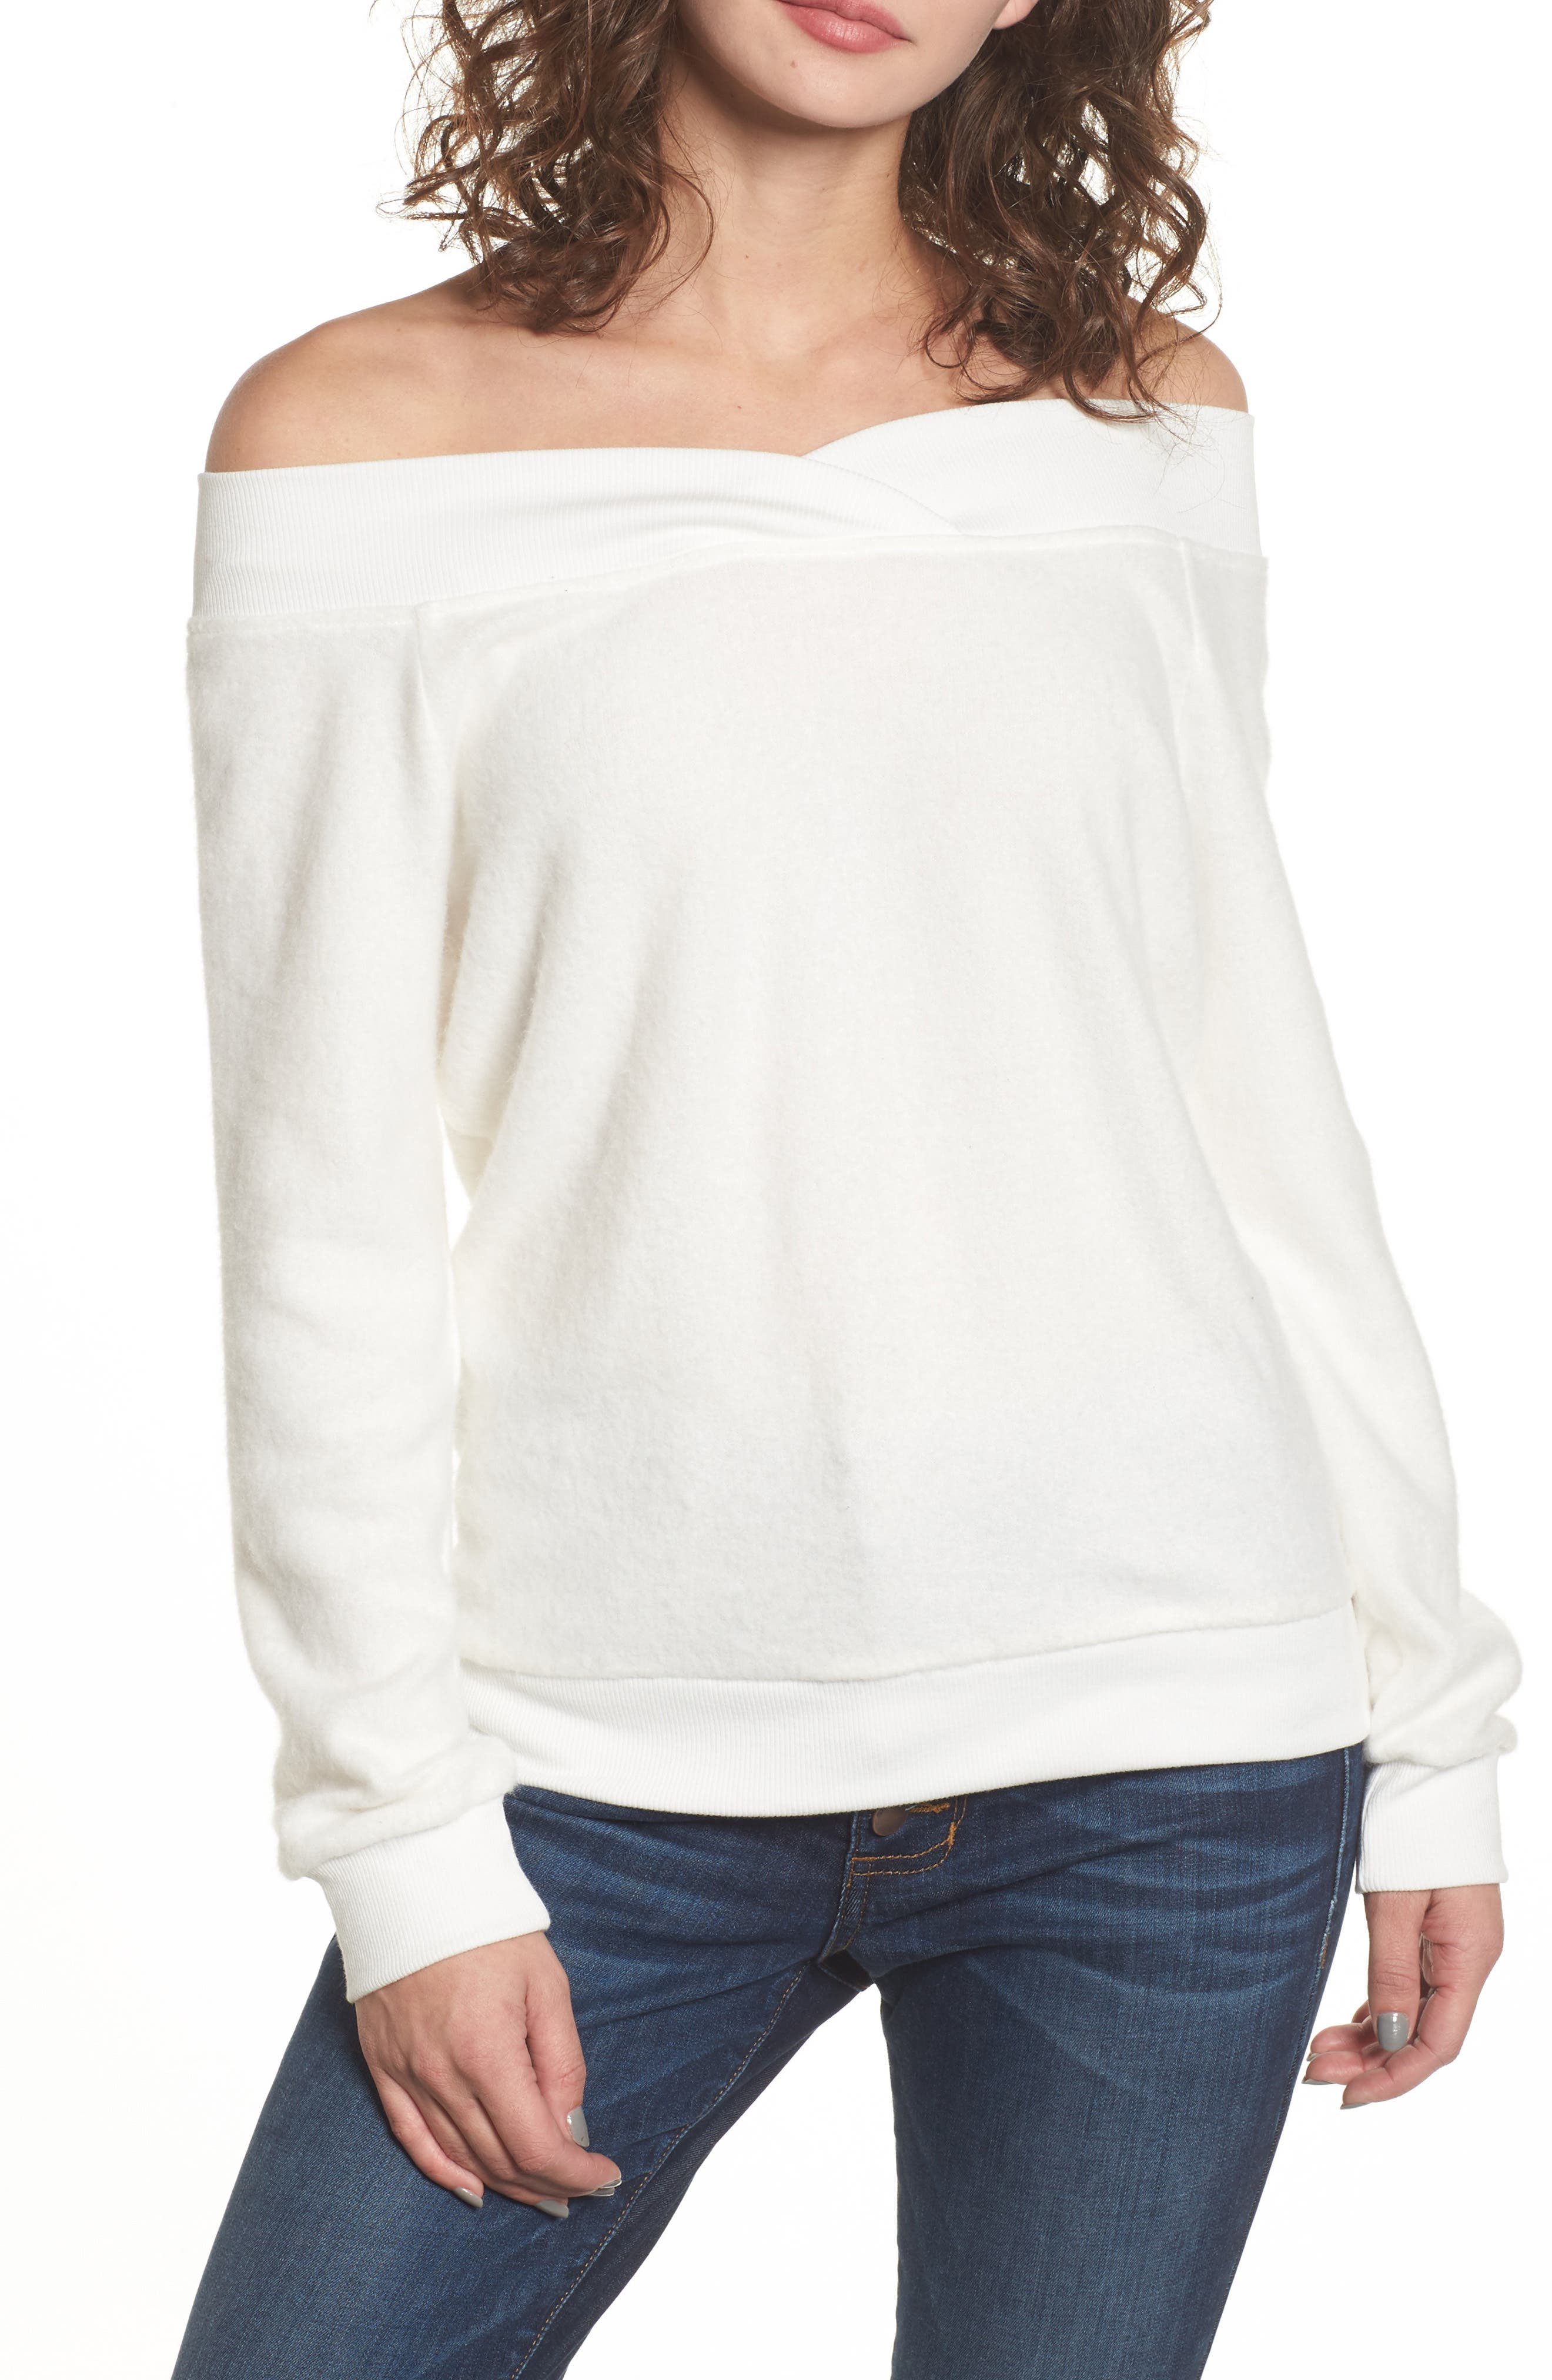 Alternate Image 1 Selected - Socialite Off the Shoulder Fleece Top